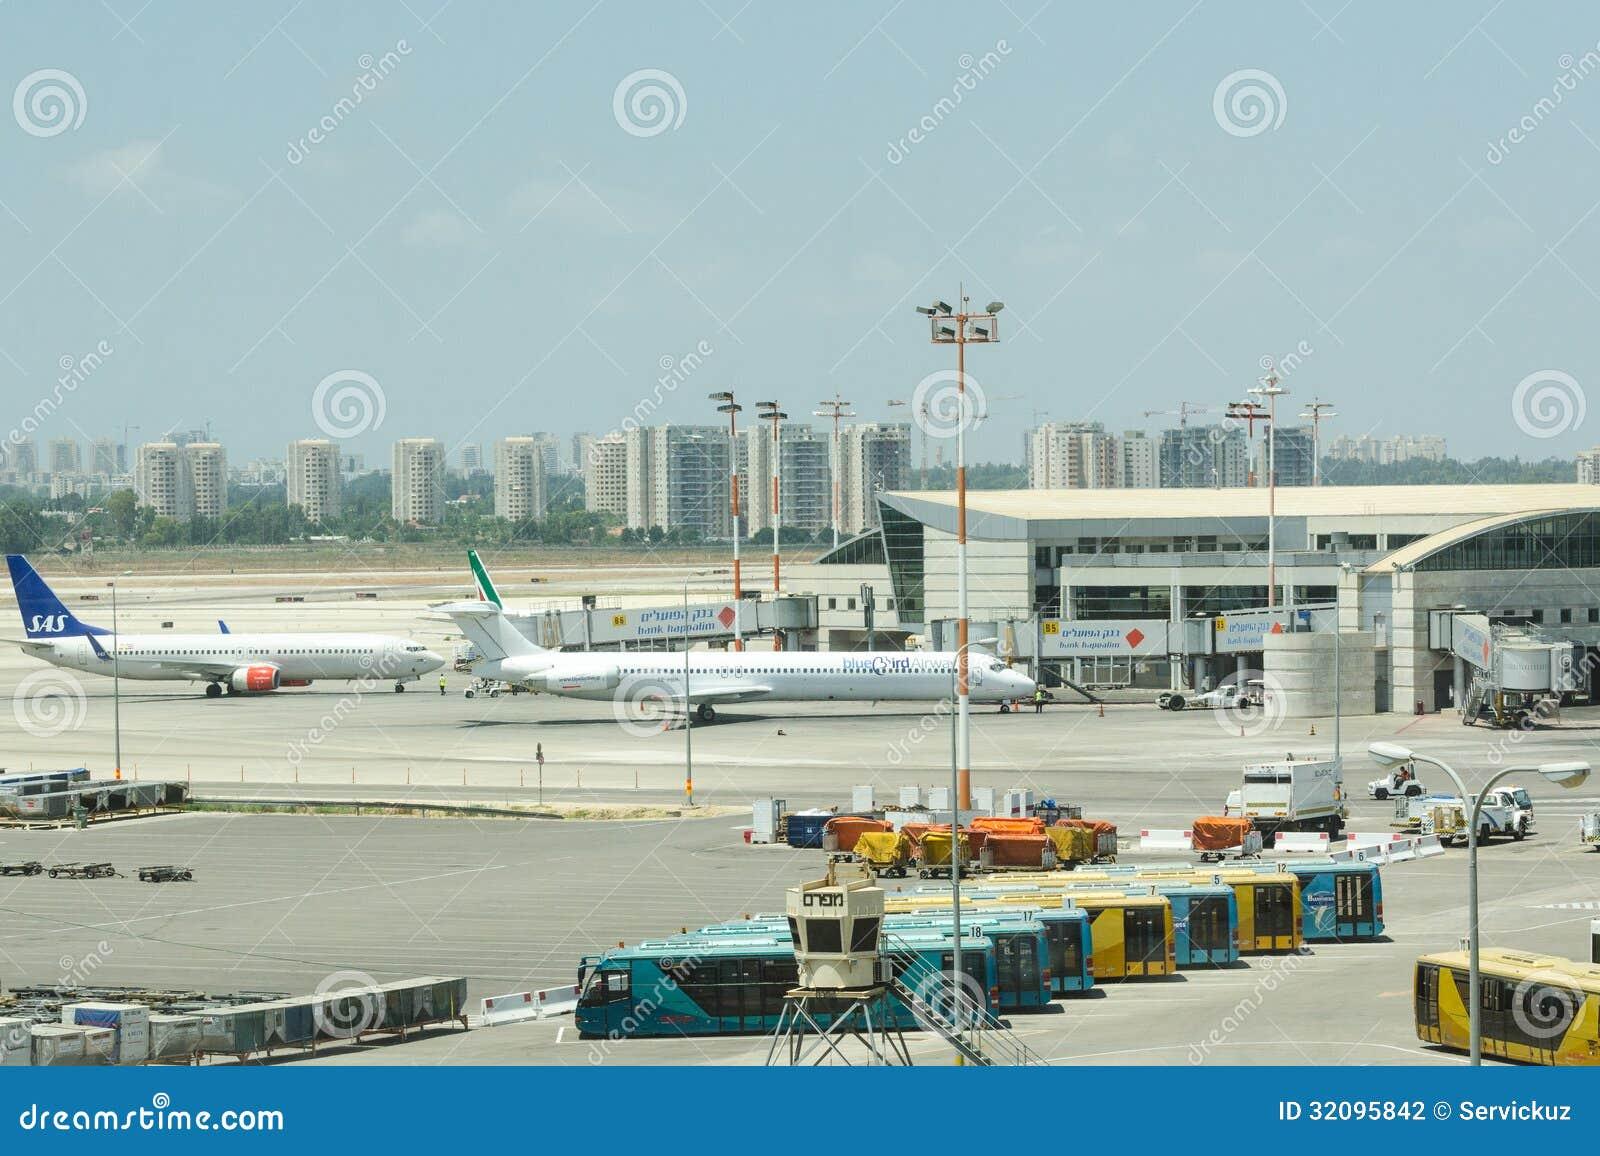 аэропорты израиля для международных леса кругляк